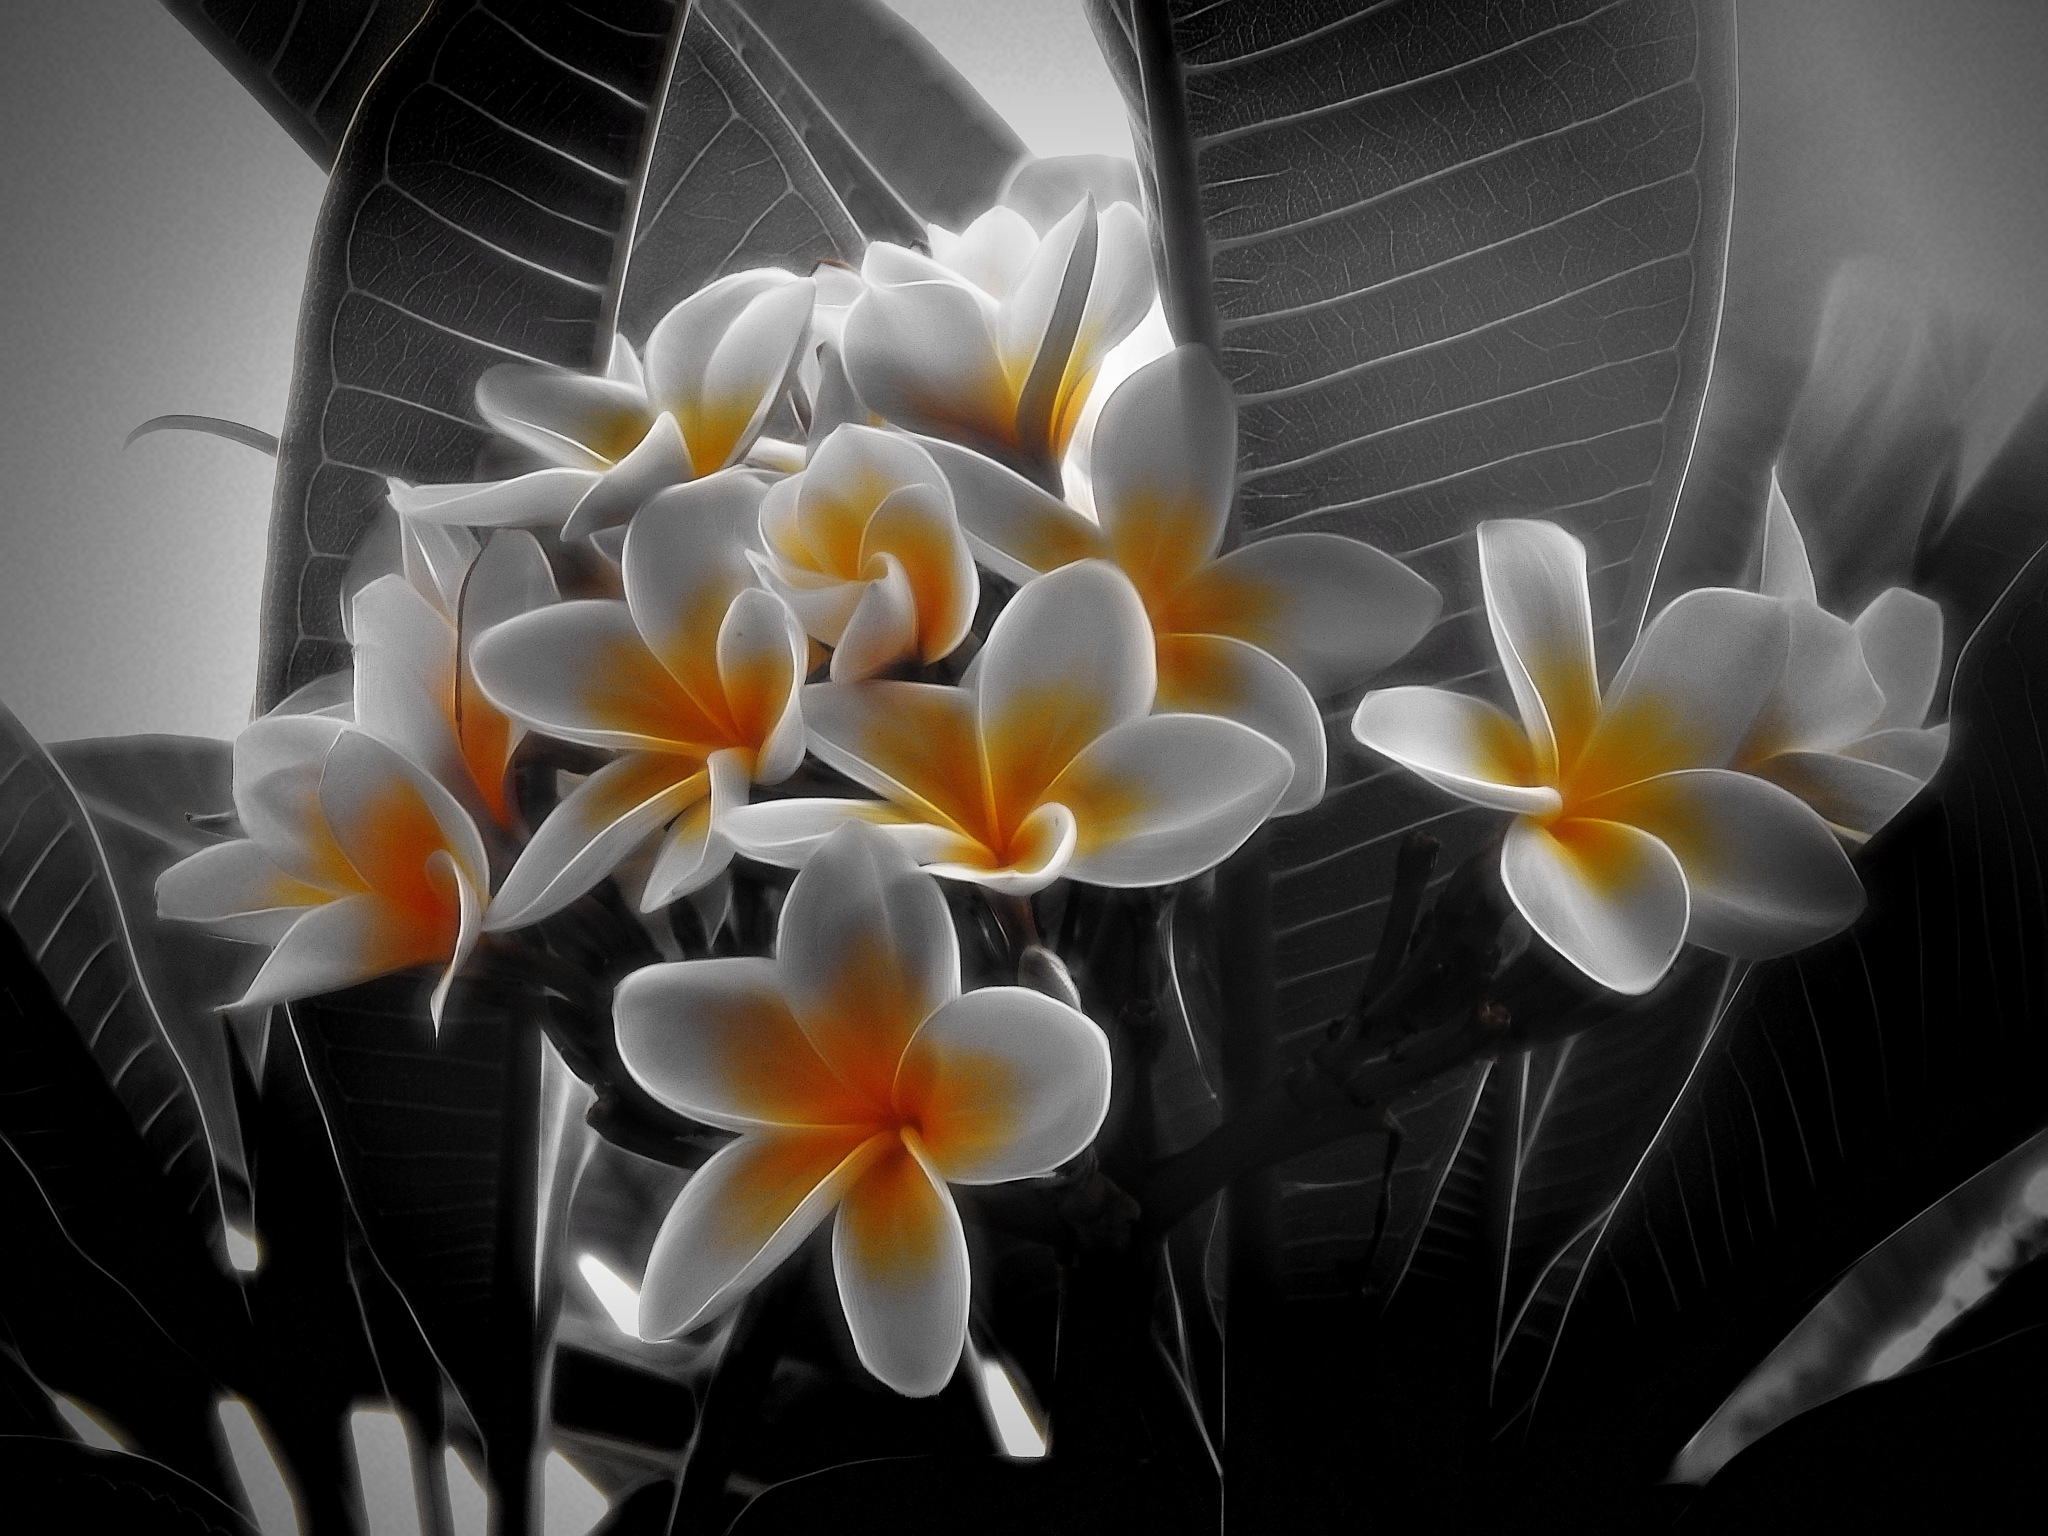 My garden by DanicaD